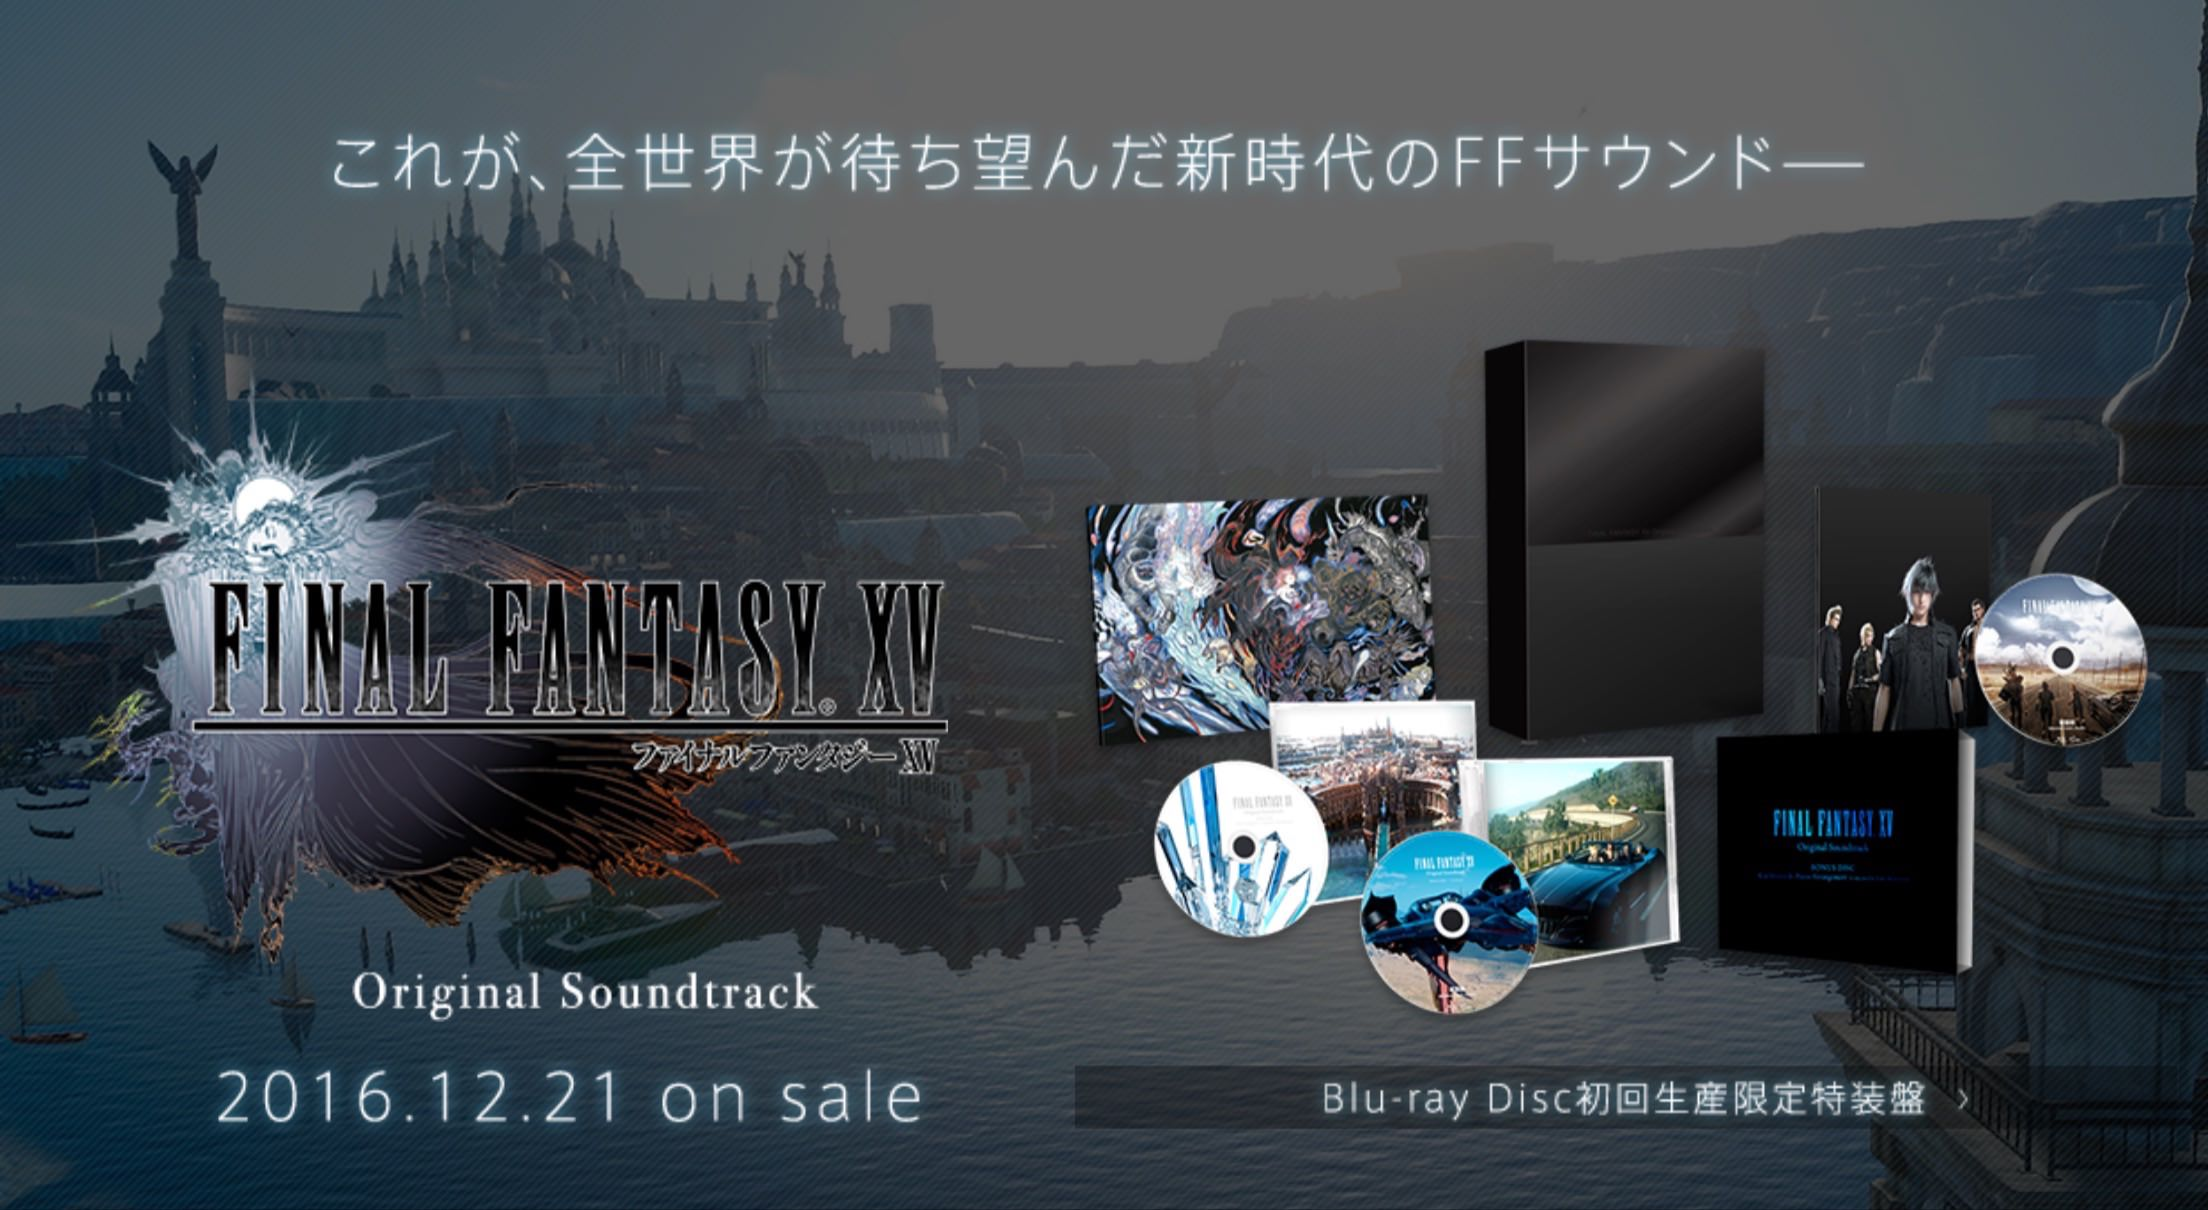 Ff15 orisinal soundtrack release 1